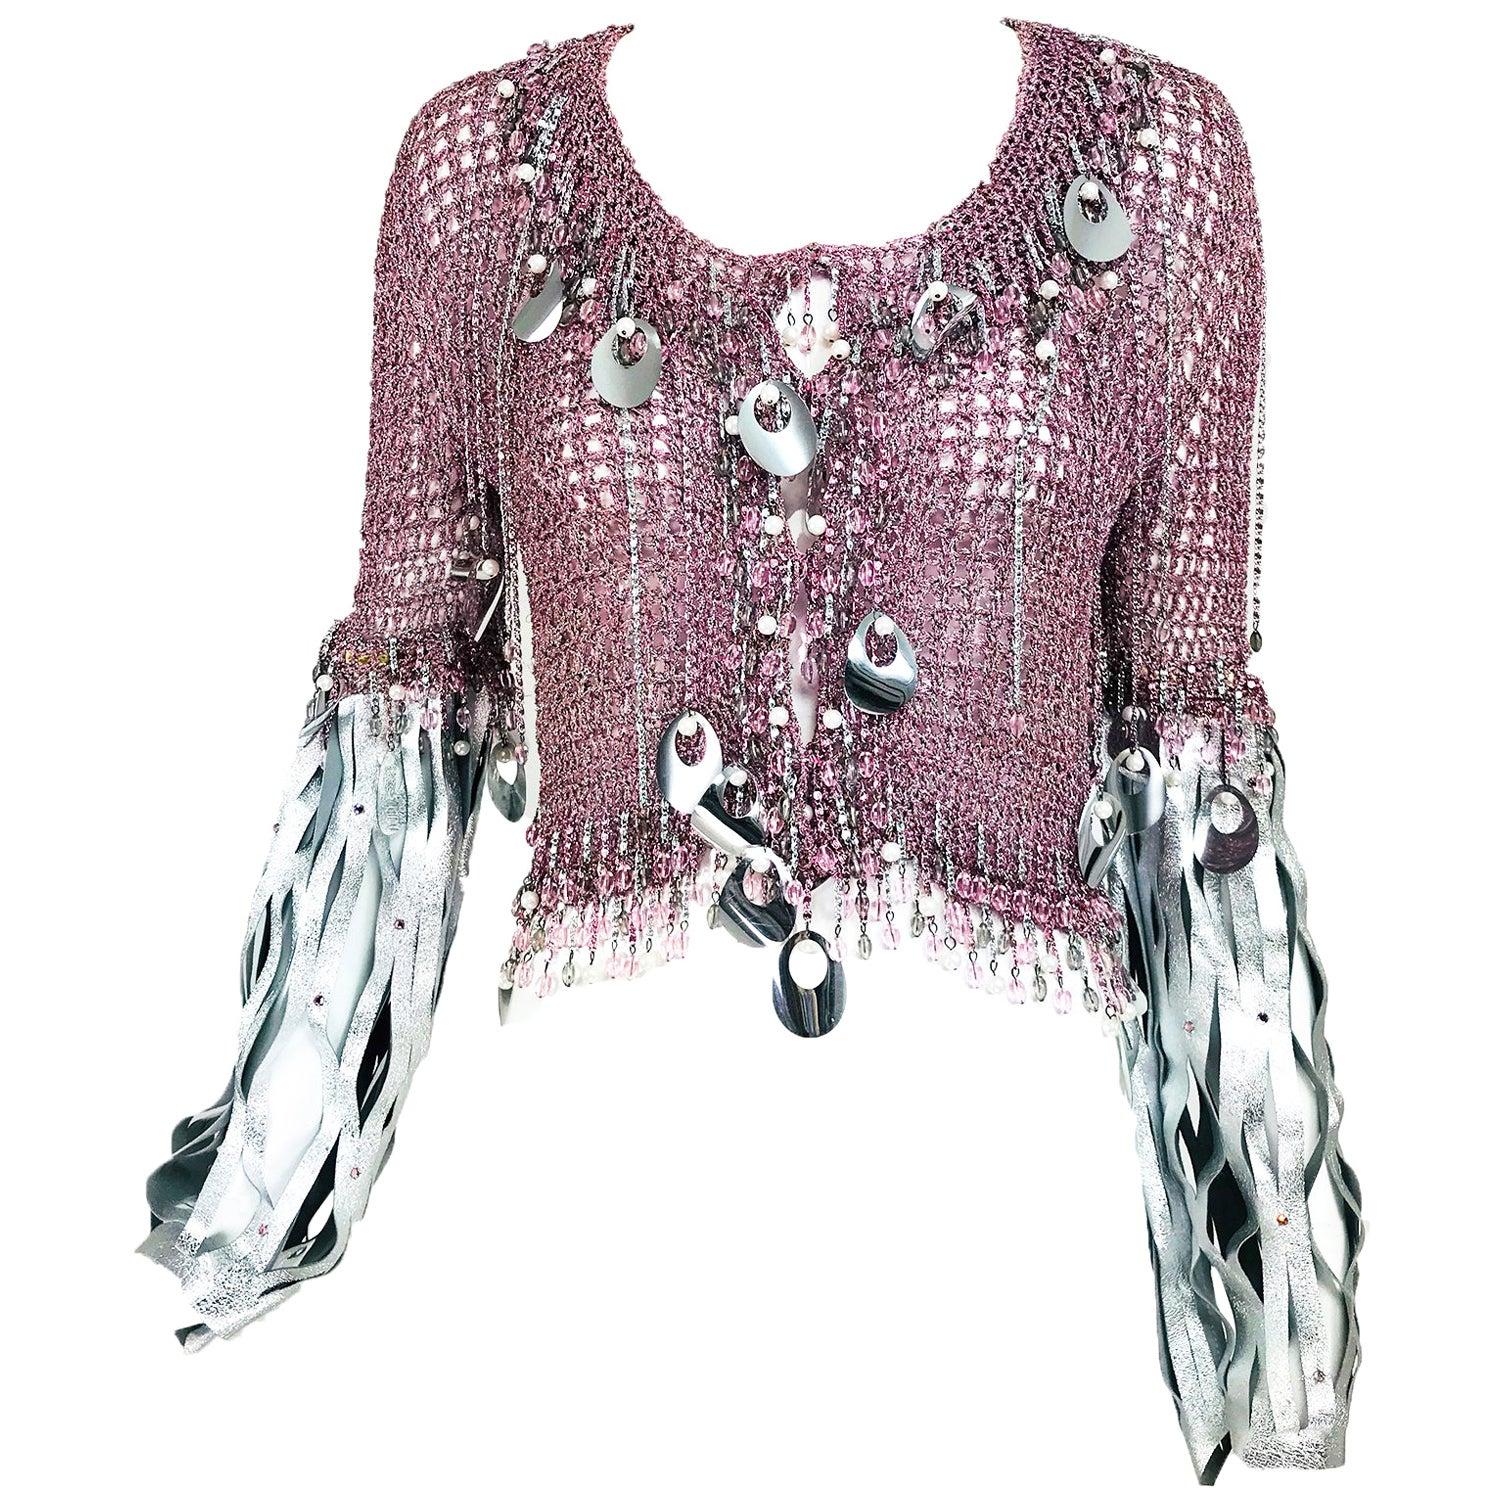 Vintage Loris Azzaro Metallic Pink and Silver Leather Sweater 1980s